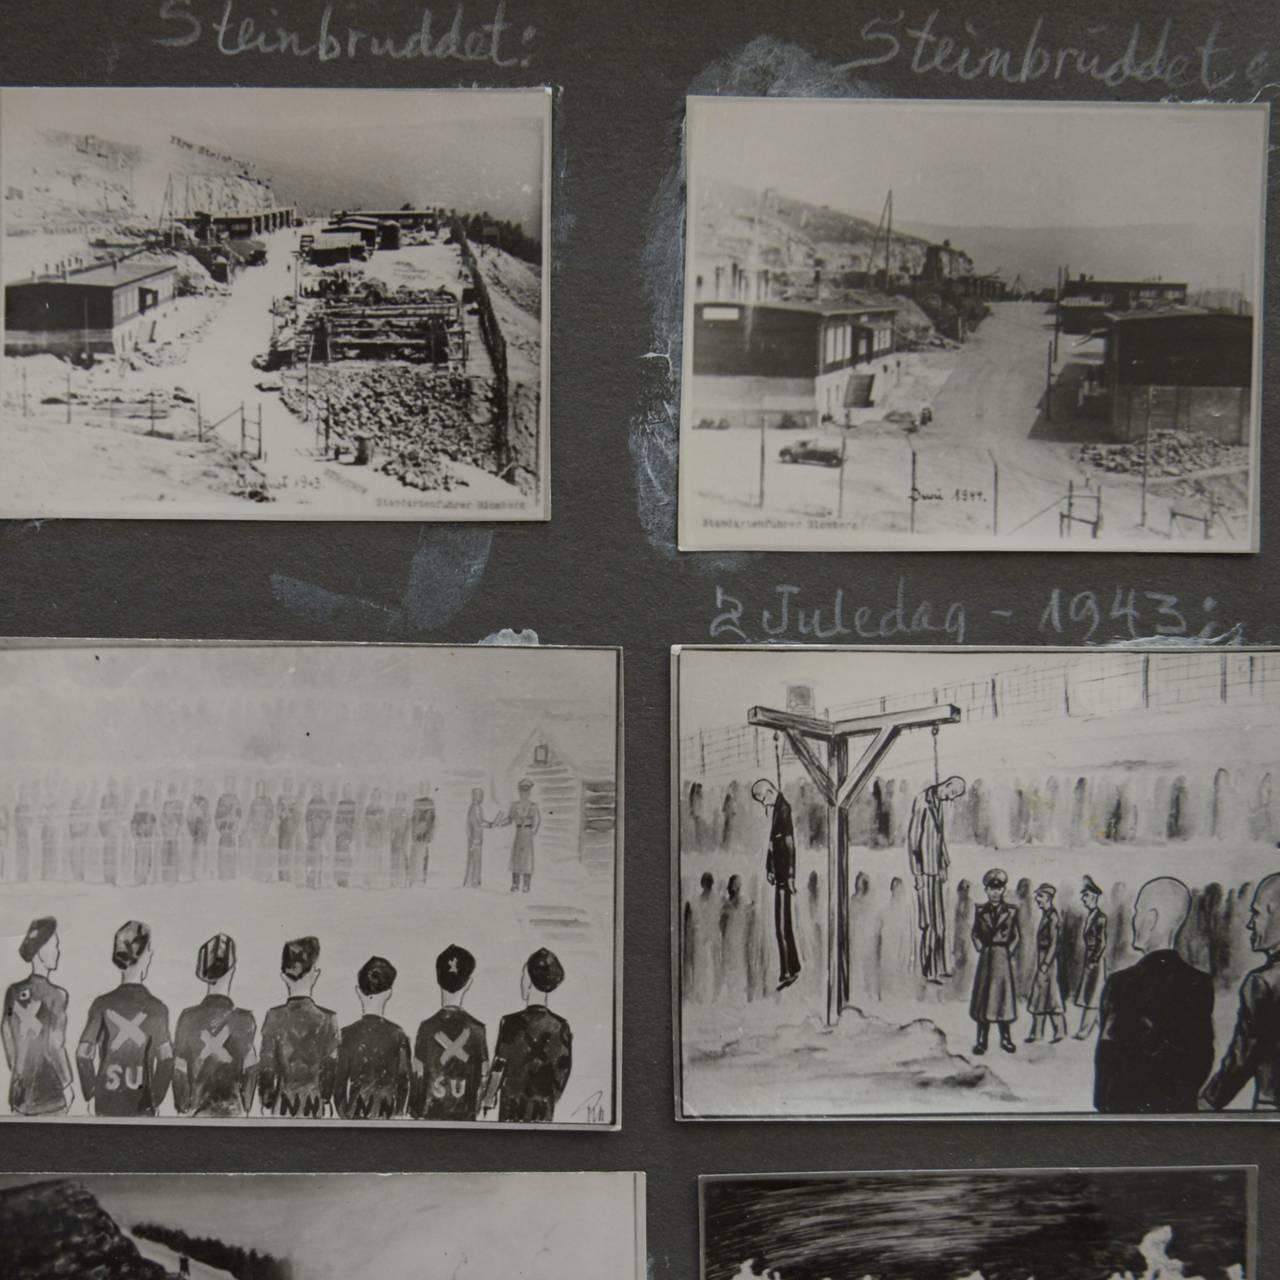 Thorvald Michelsens fotoalbum med teikningar frå Natzweiler.